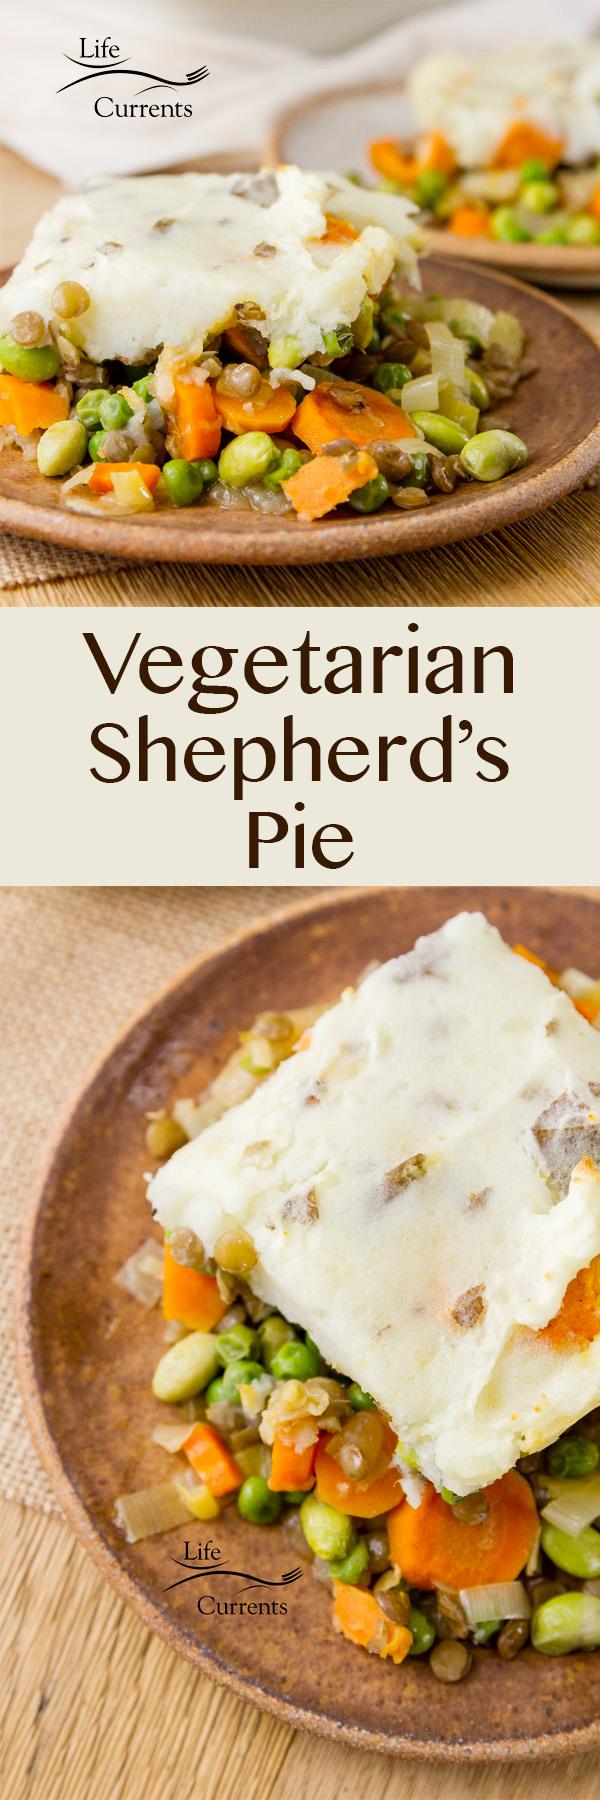 Vegetarian Shepherd's Pie is a great healthy veggie loaded comfort food dish